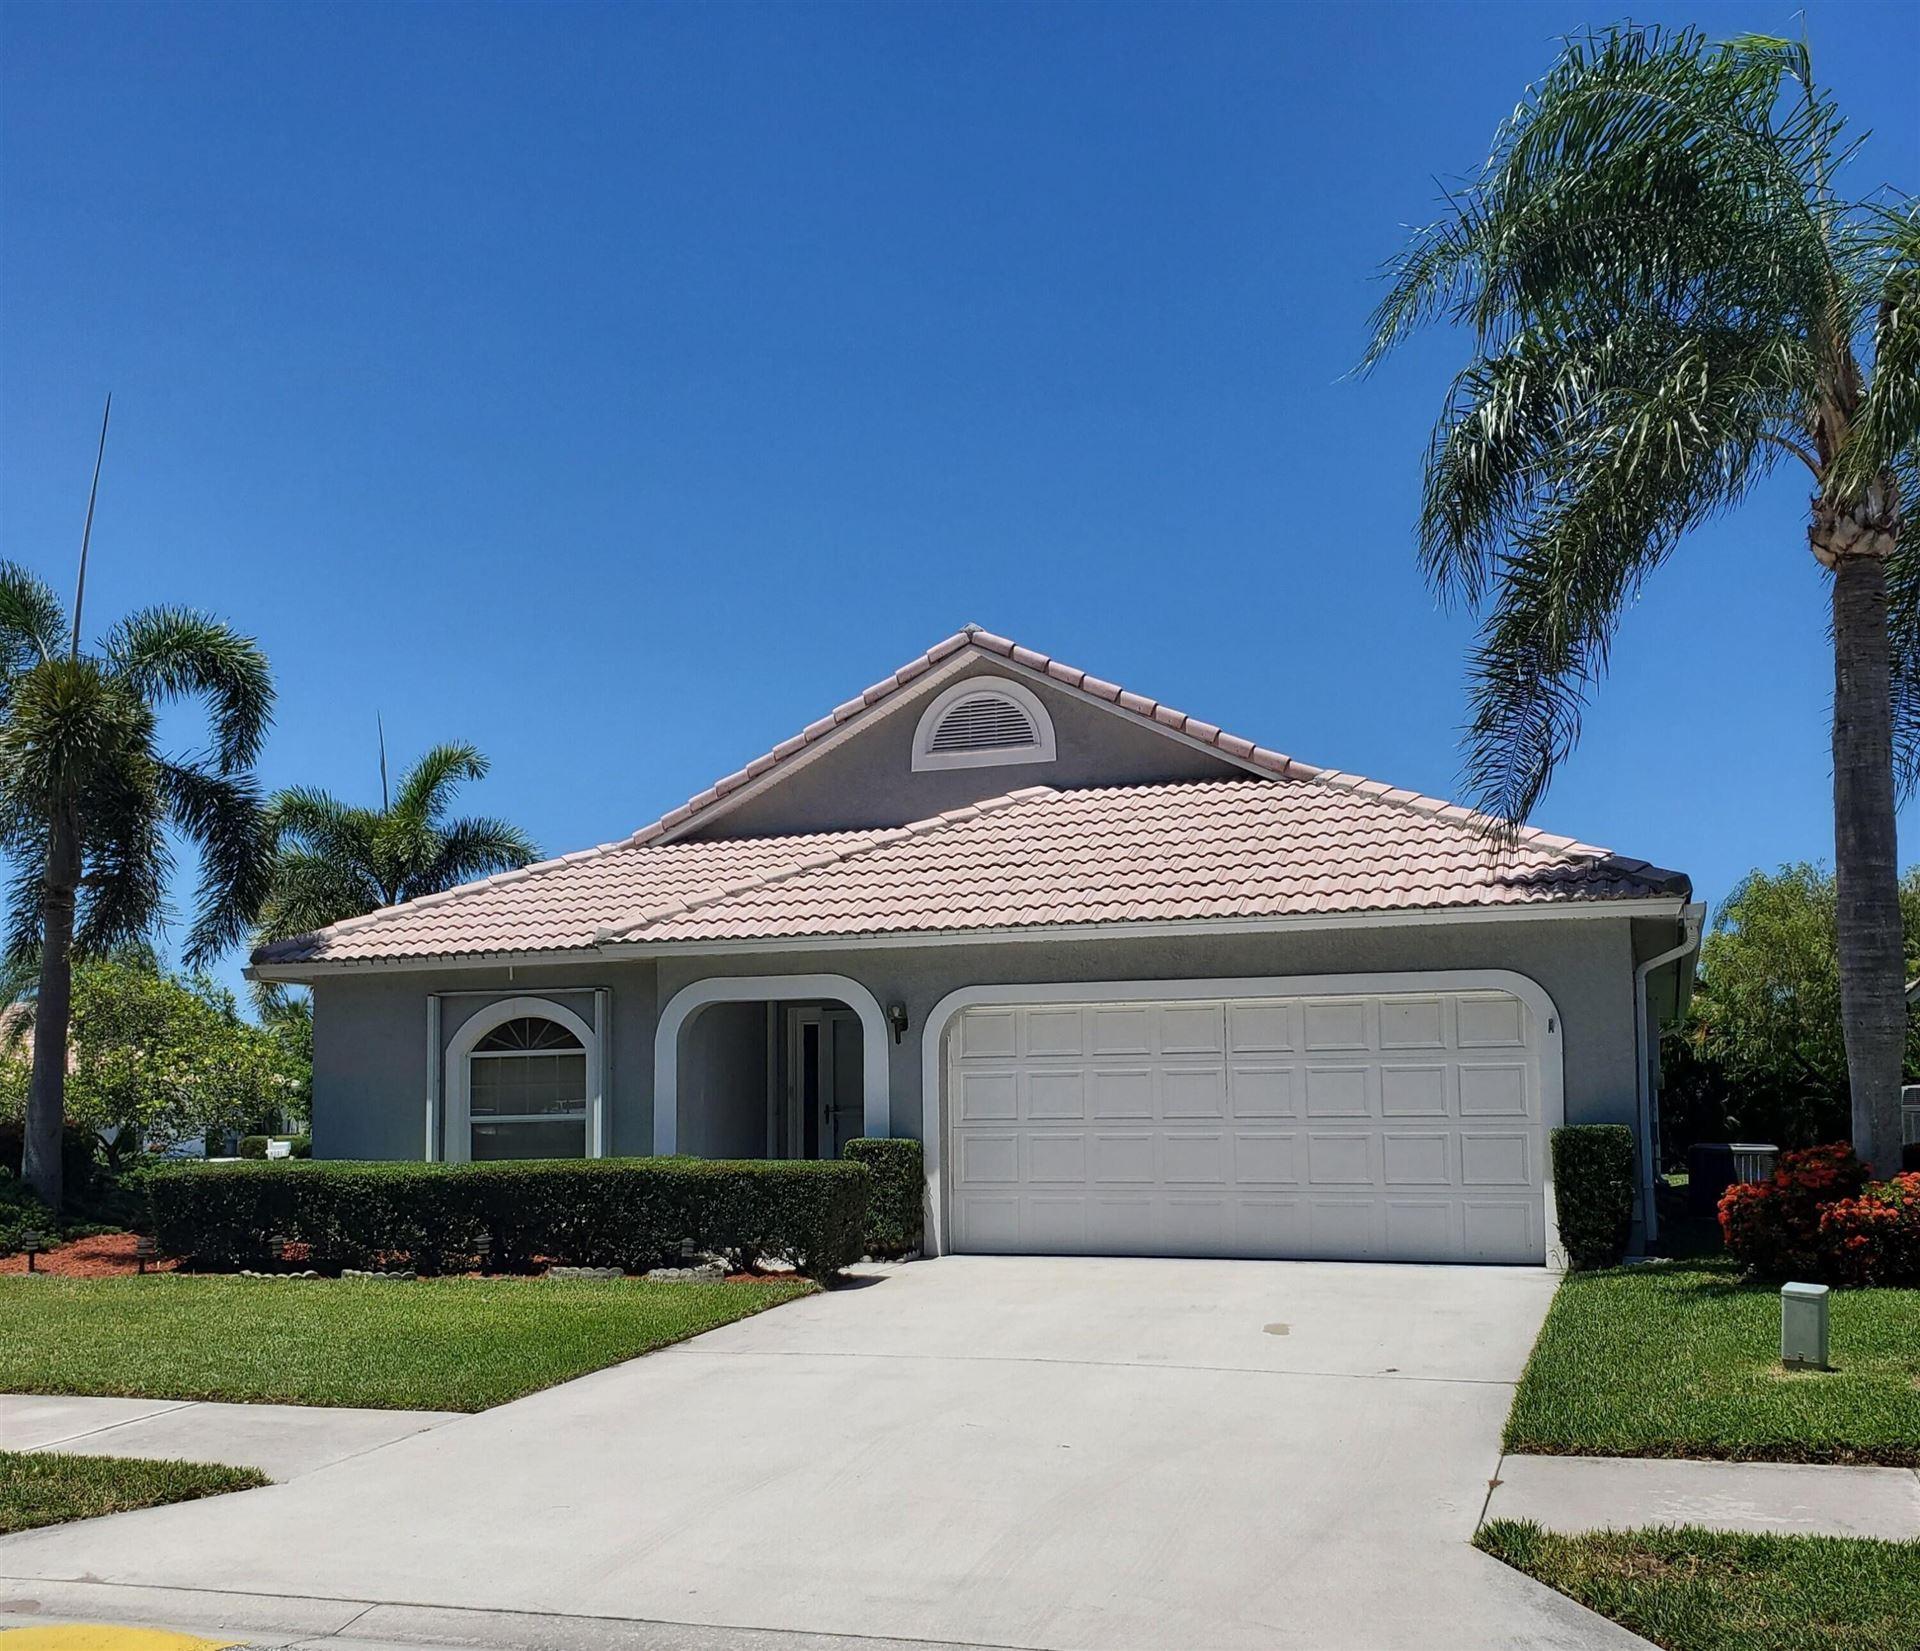 6352 SE Windsong Lane, Stuart, FL 34997 - MLS#: RX-10723457